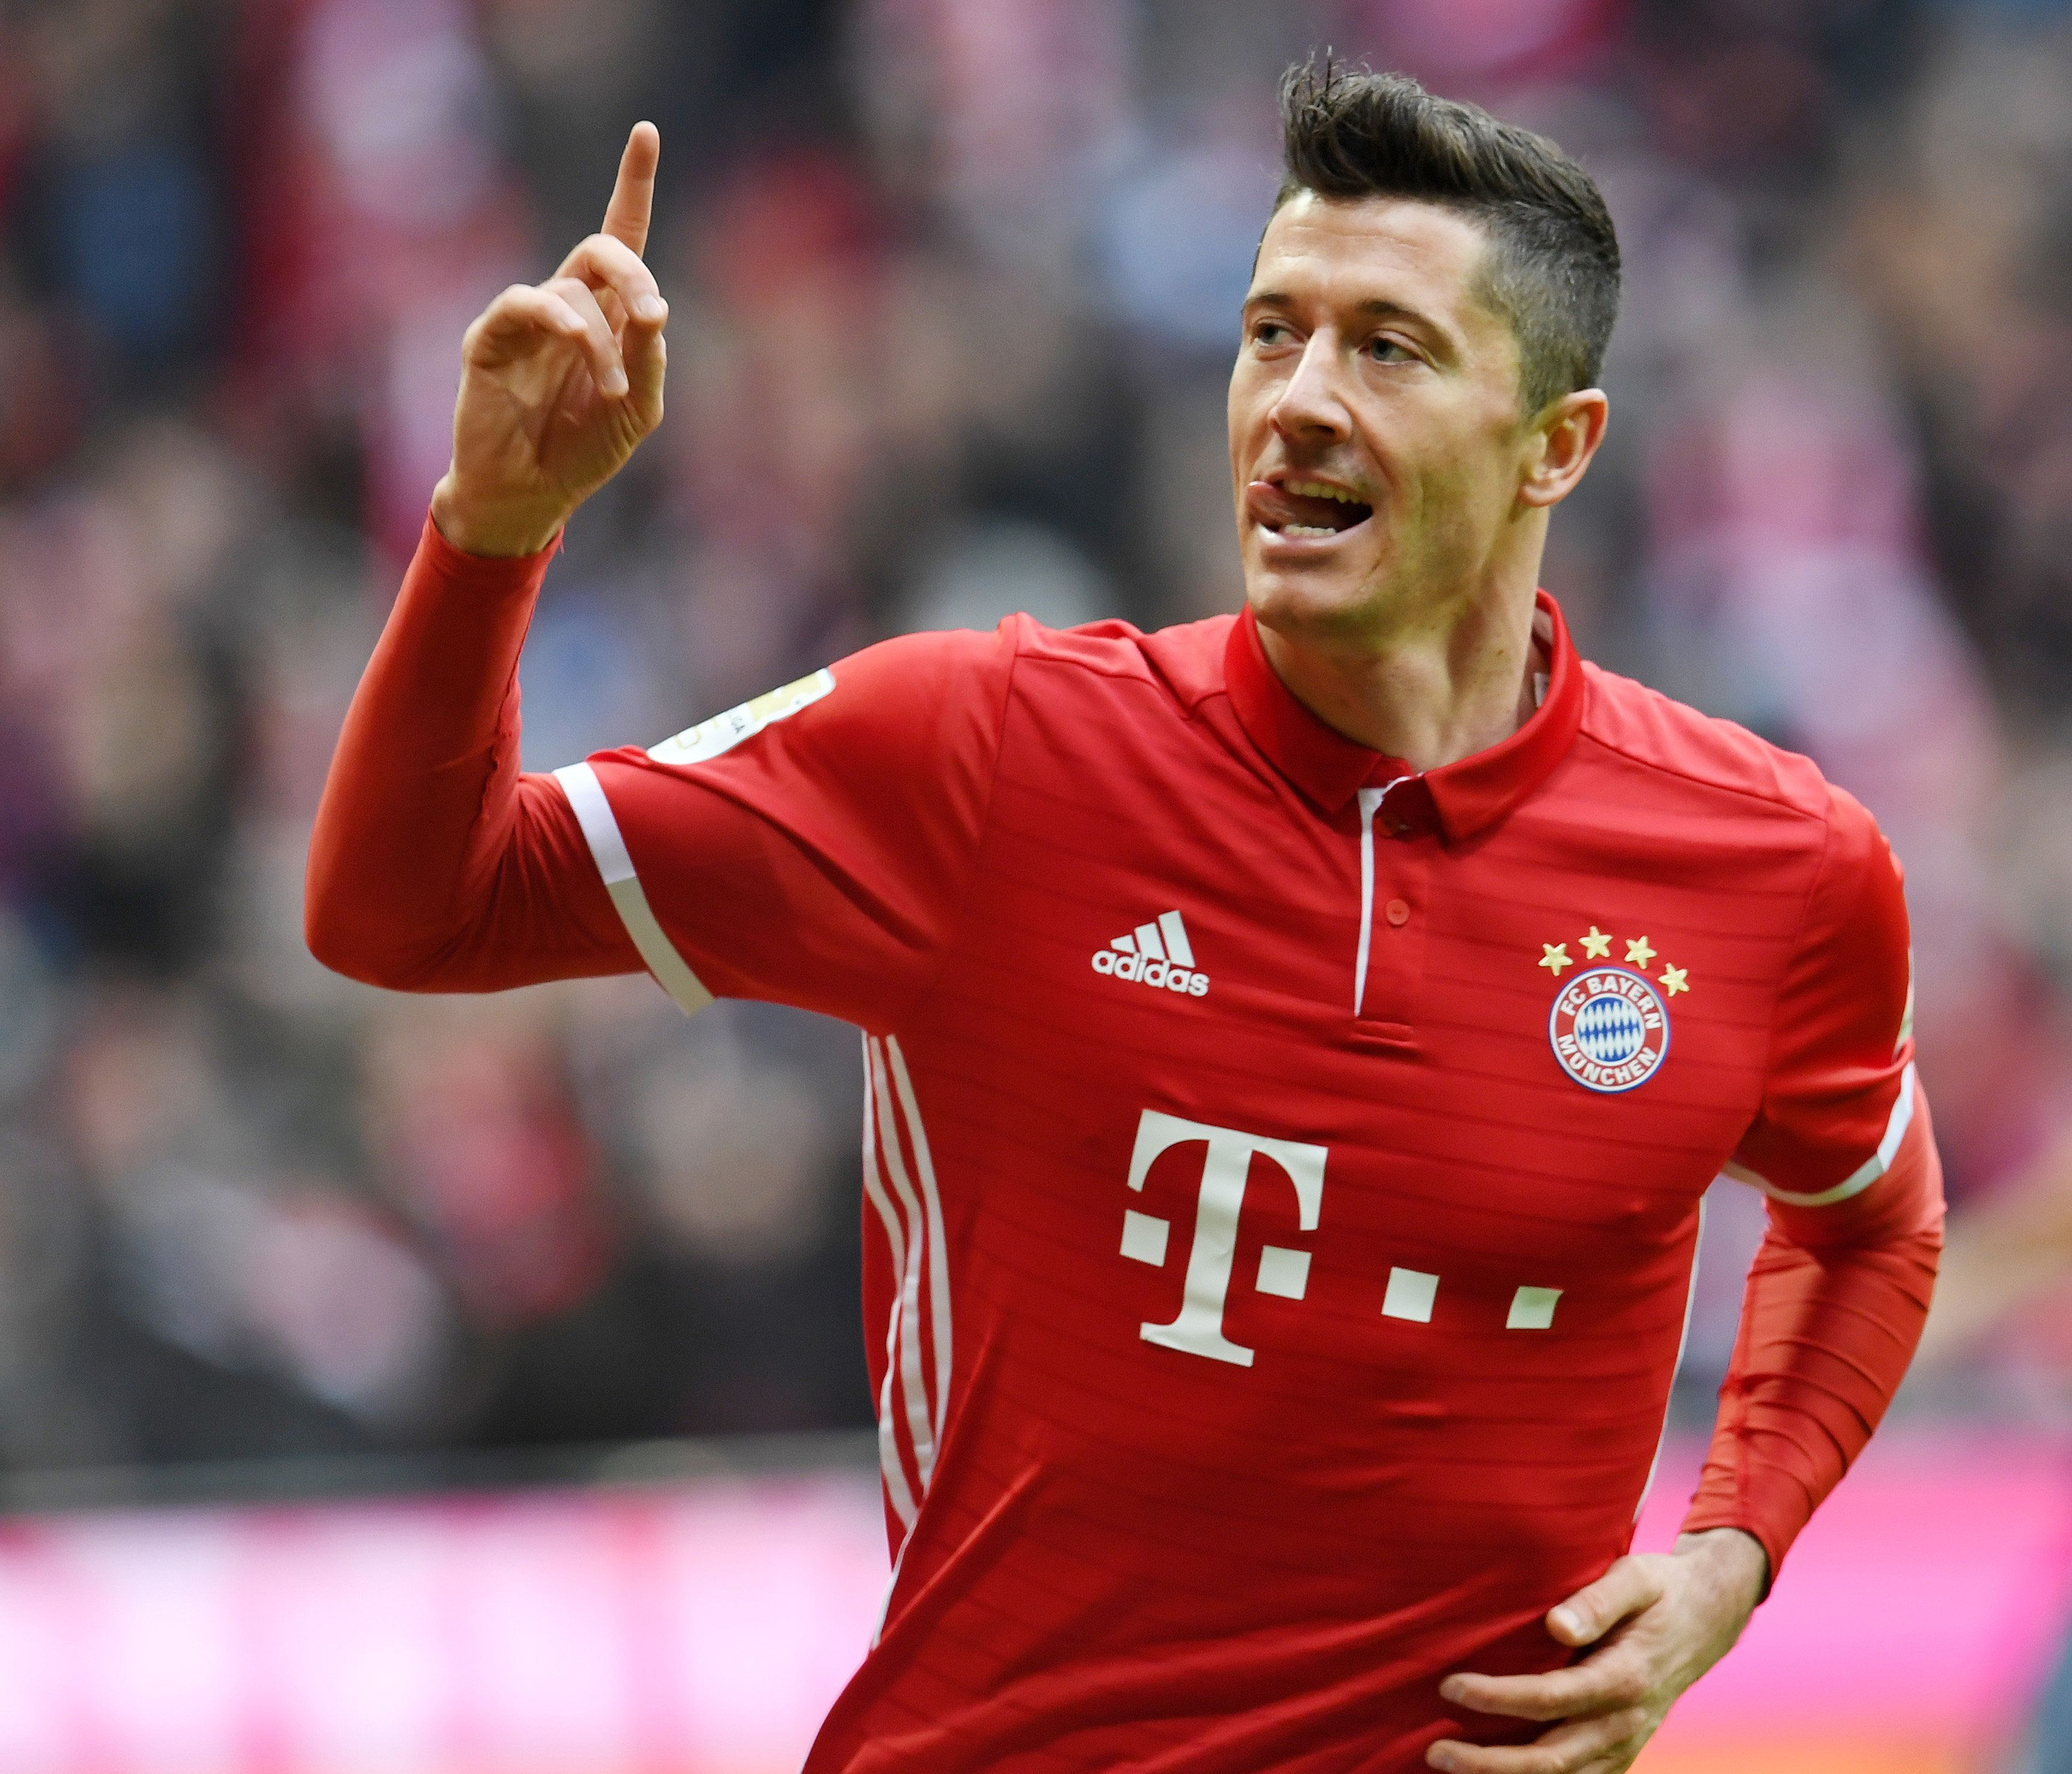 FC Bayern - Schalke im Live-Stream: Bundesliga online sehen, so